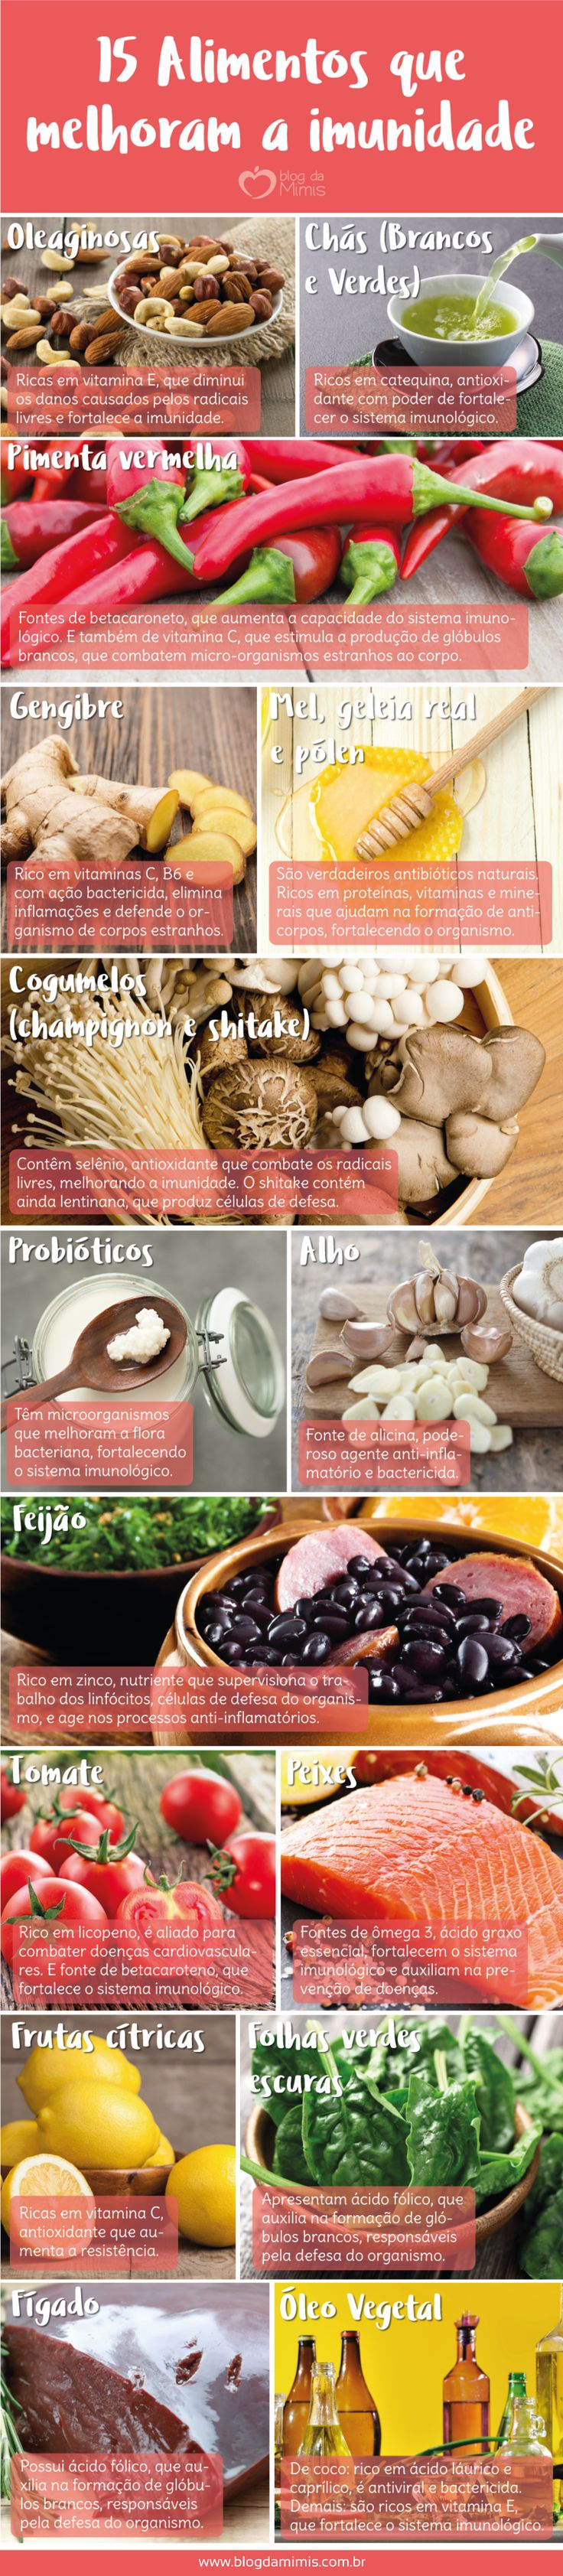 alimentos-melhoram-imunidade-blog-da-mimis-michelle-franzoni-post.png (900×4118)